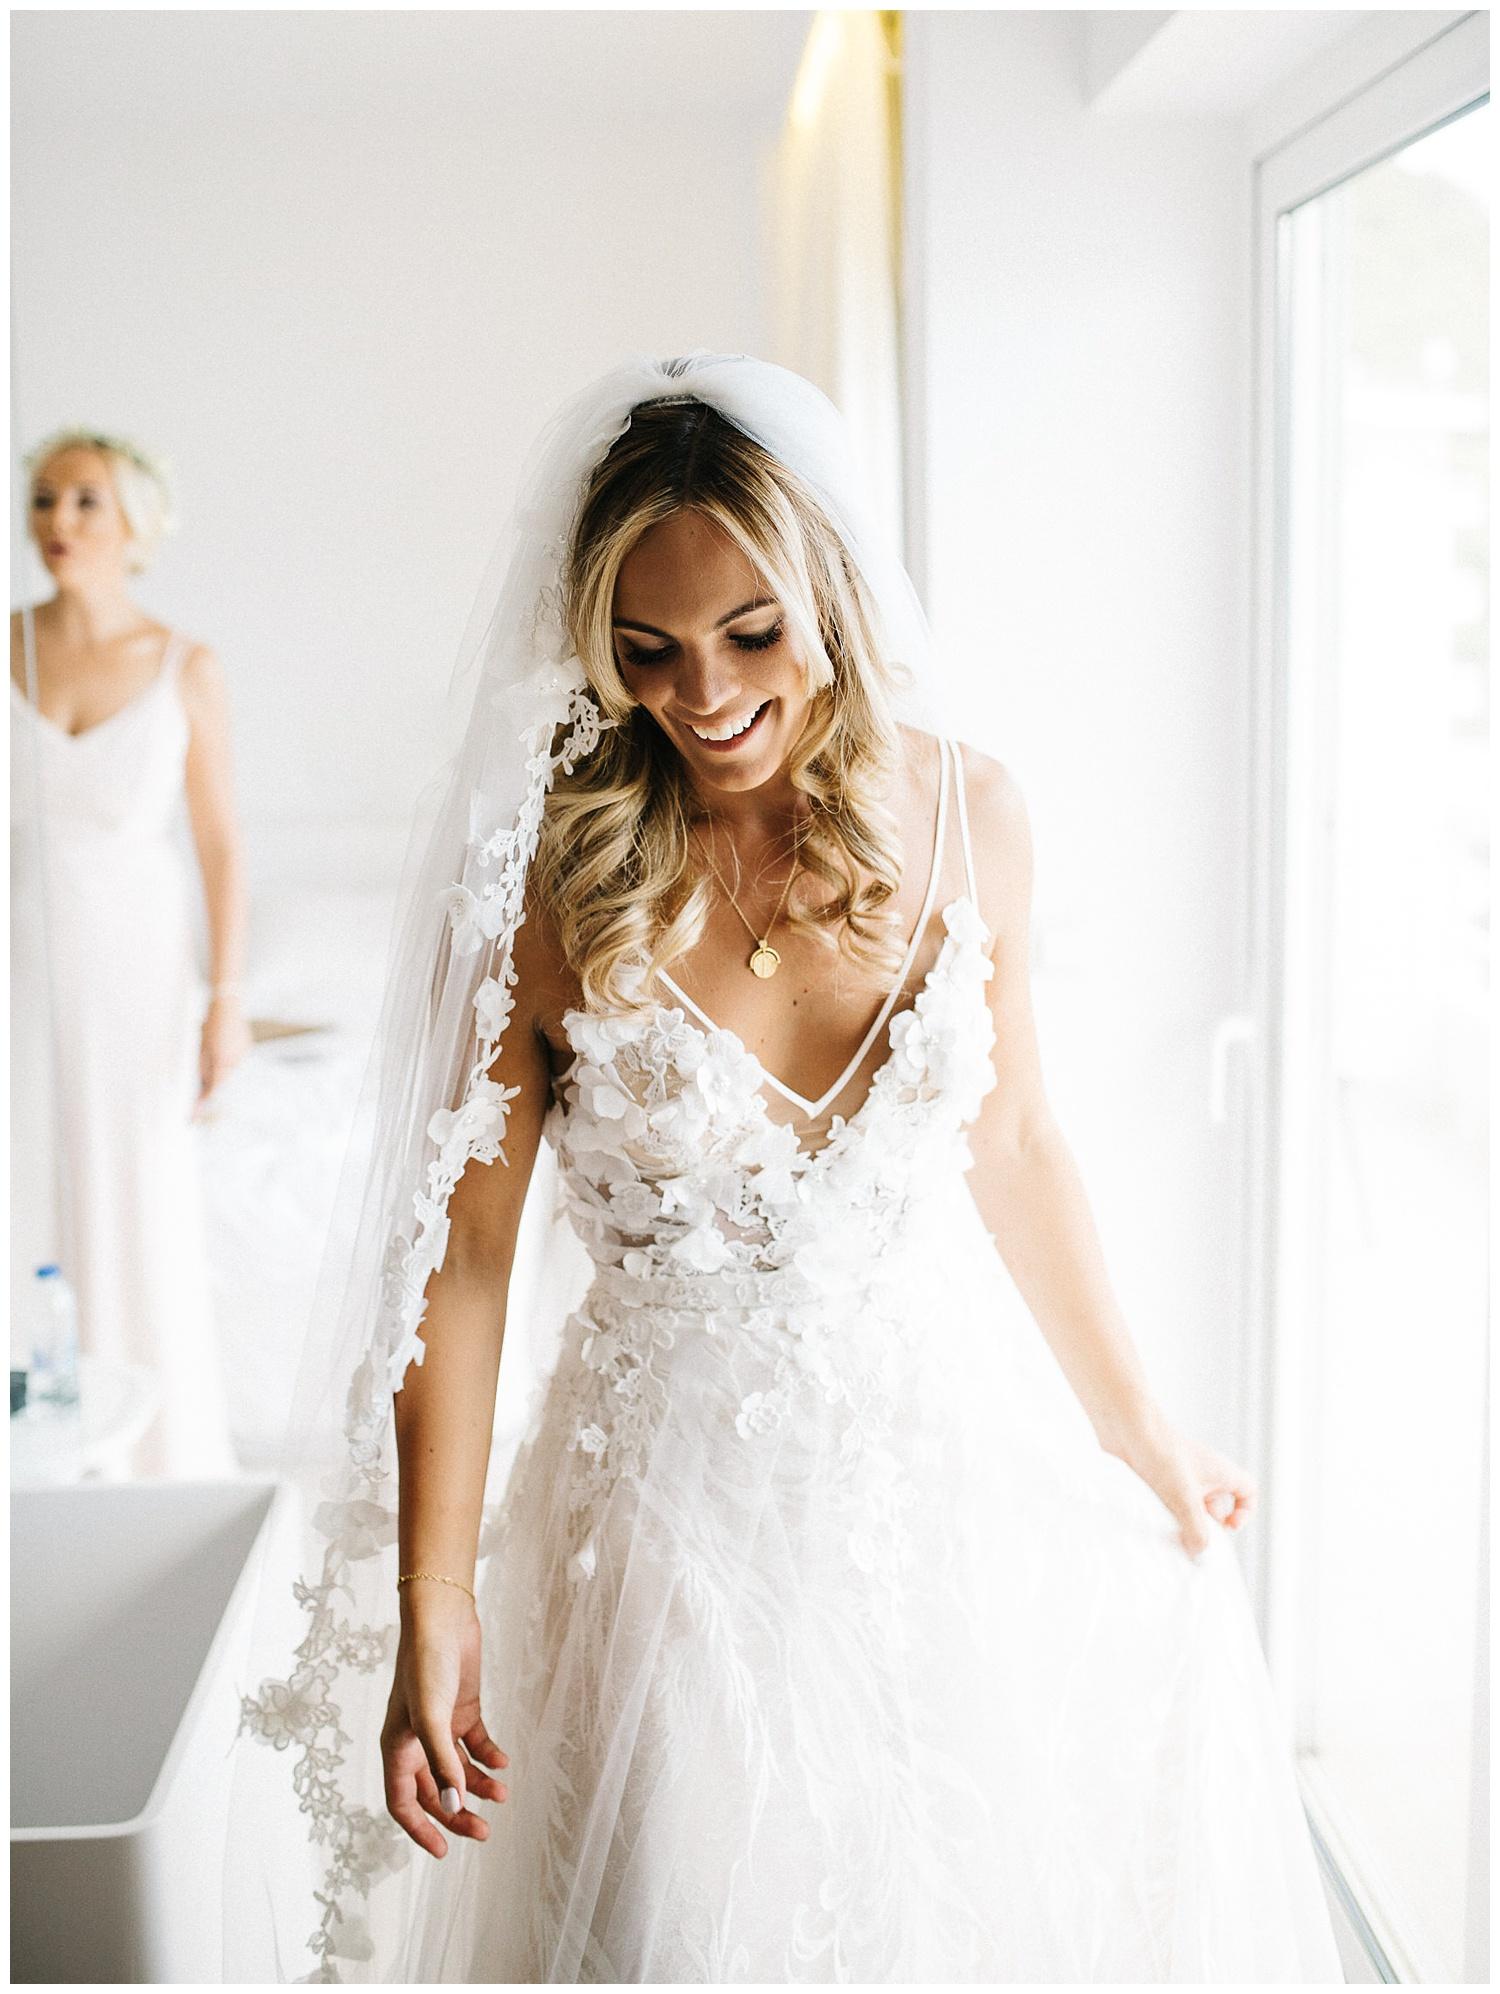 Greece Destination Wedding Photographer-36.jpg